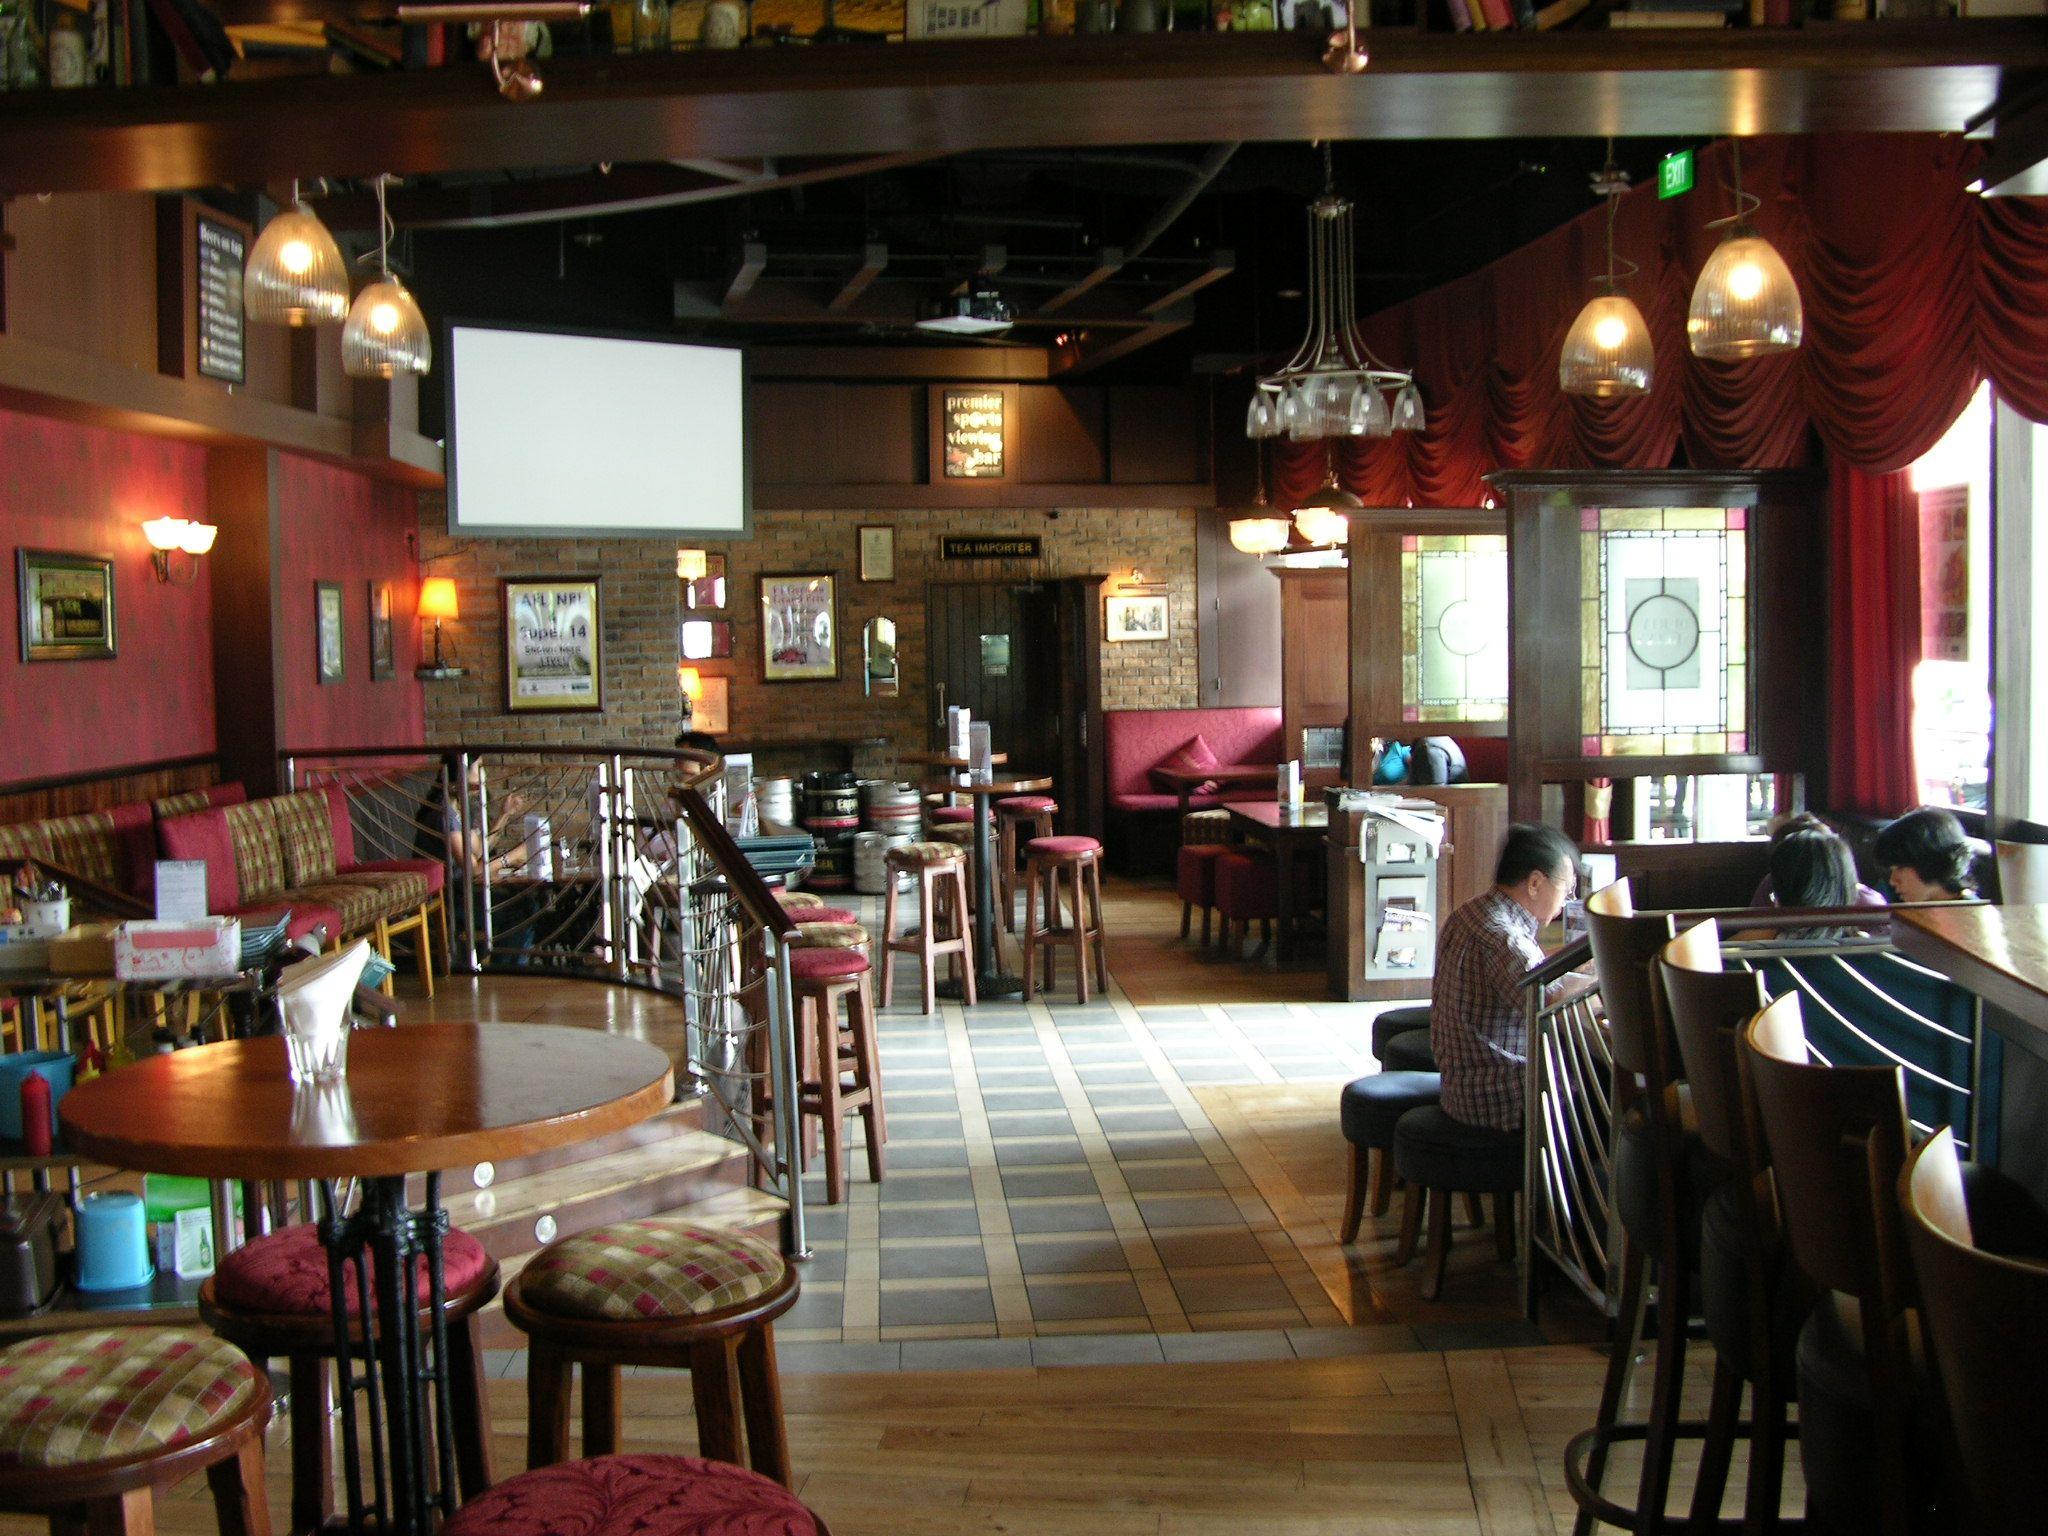 pubs interiors - Szukaj w Google | bistro | Pinterest | Pub interior ...